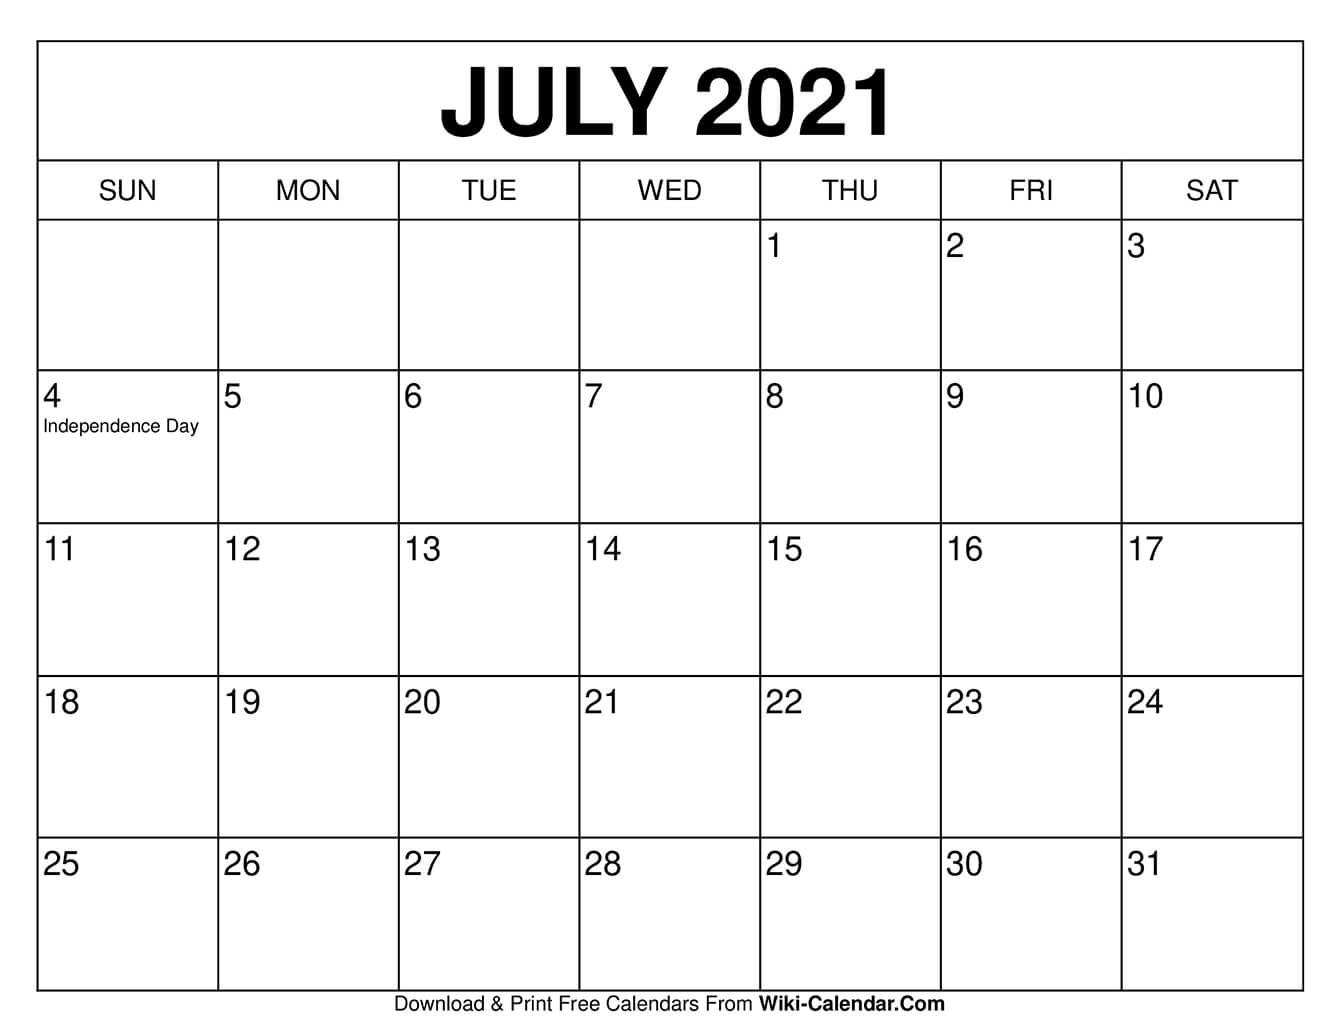 July 2021 Calendar